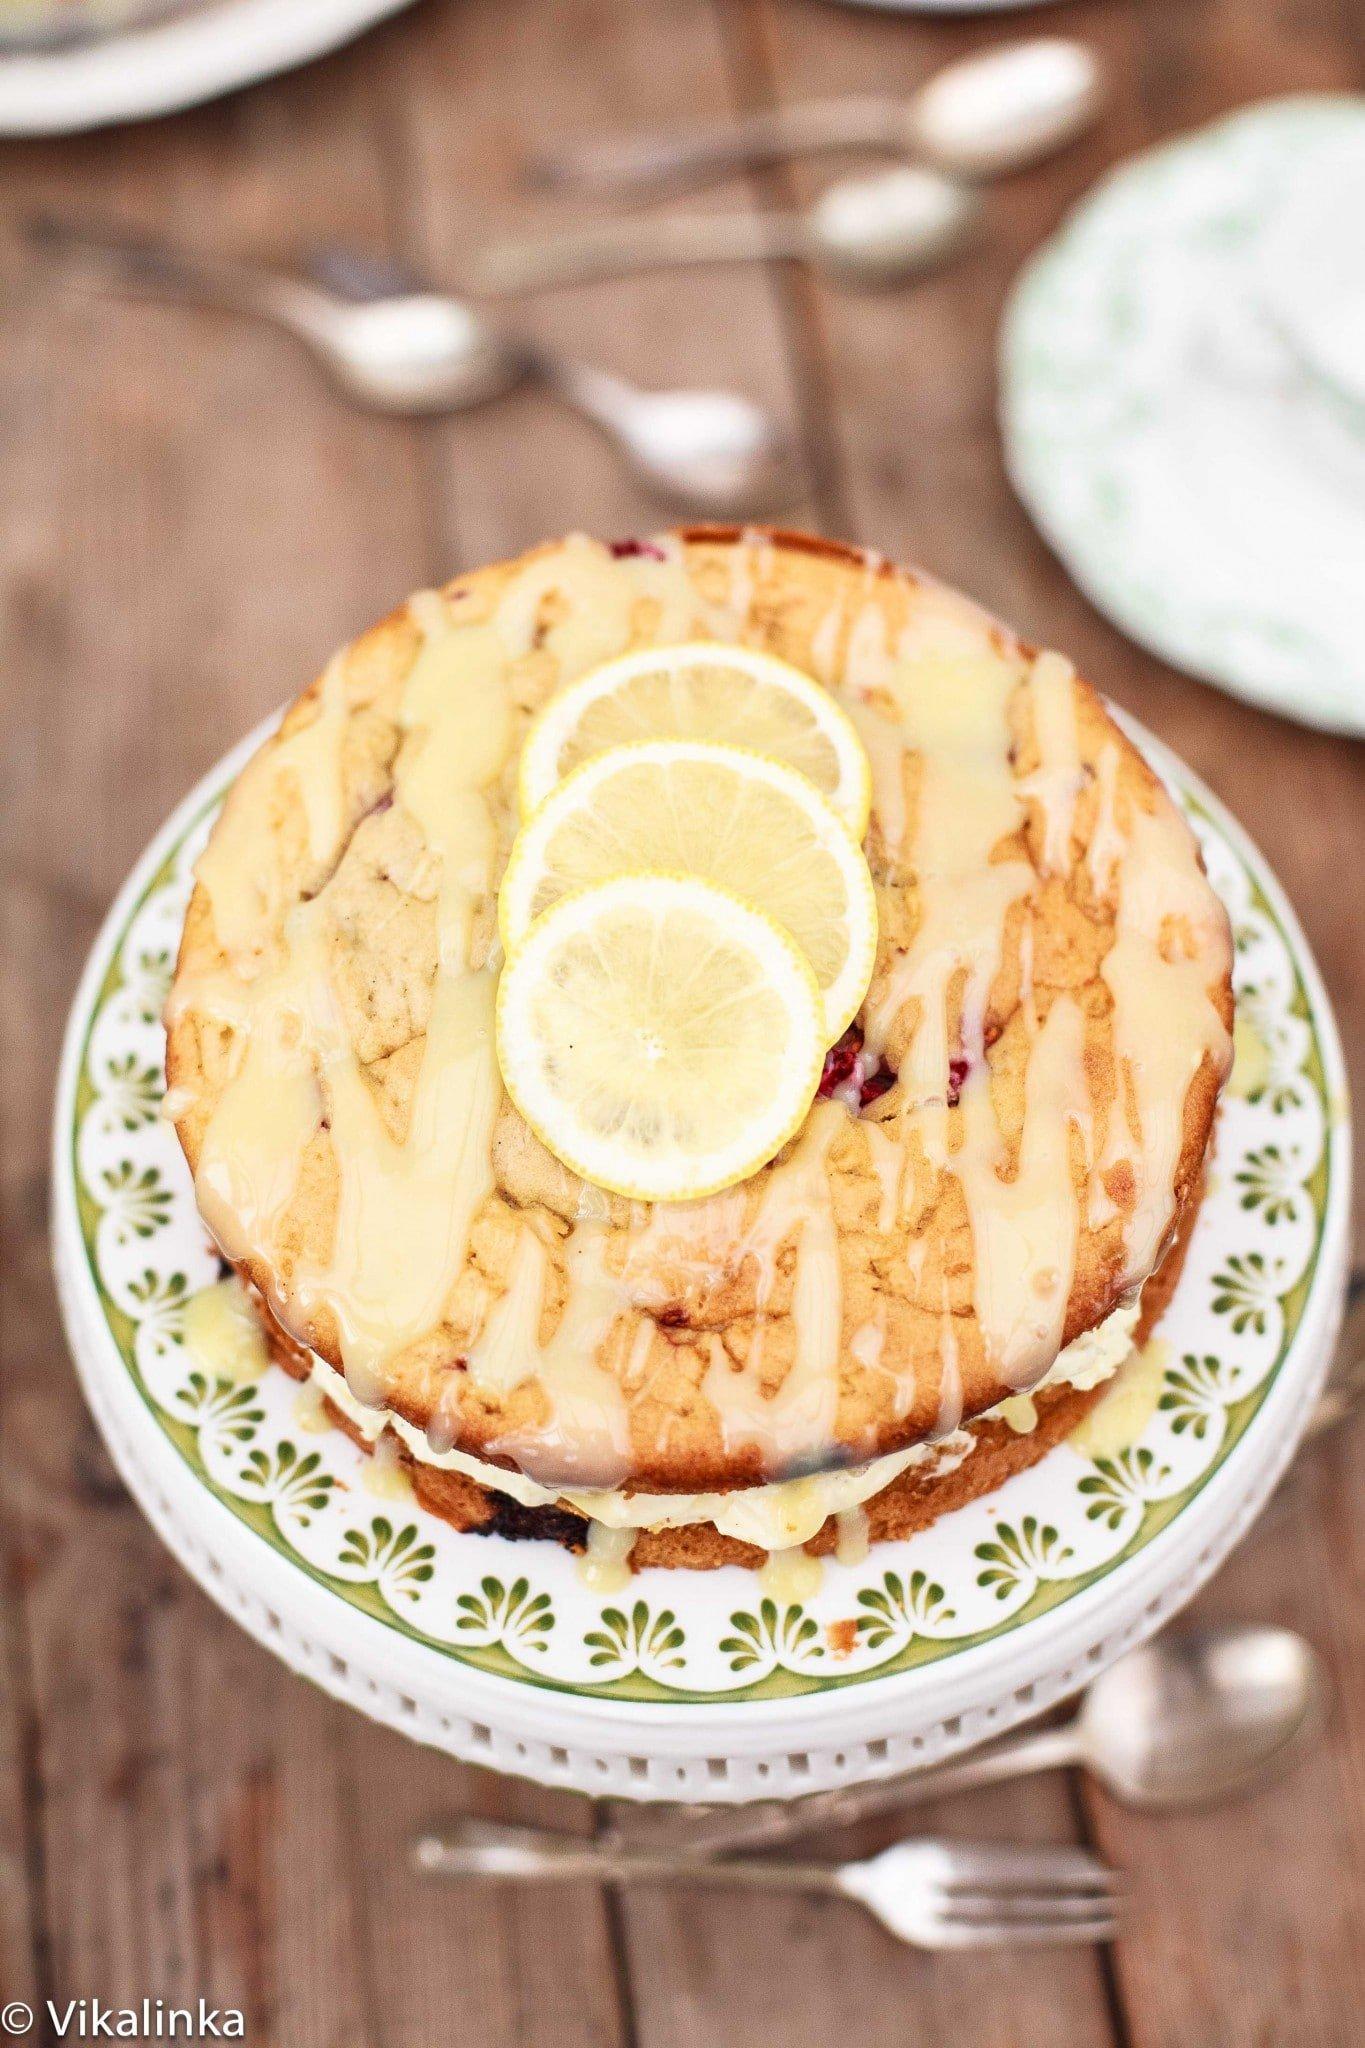 Raspberry Limoncello Cake with Mascarpone Frosting